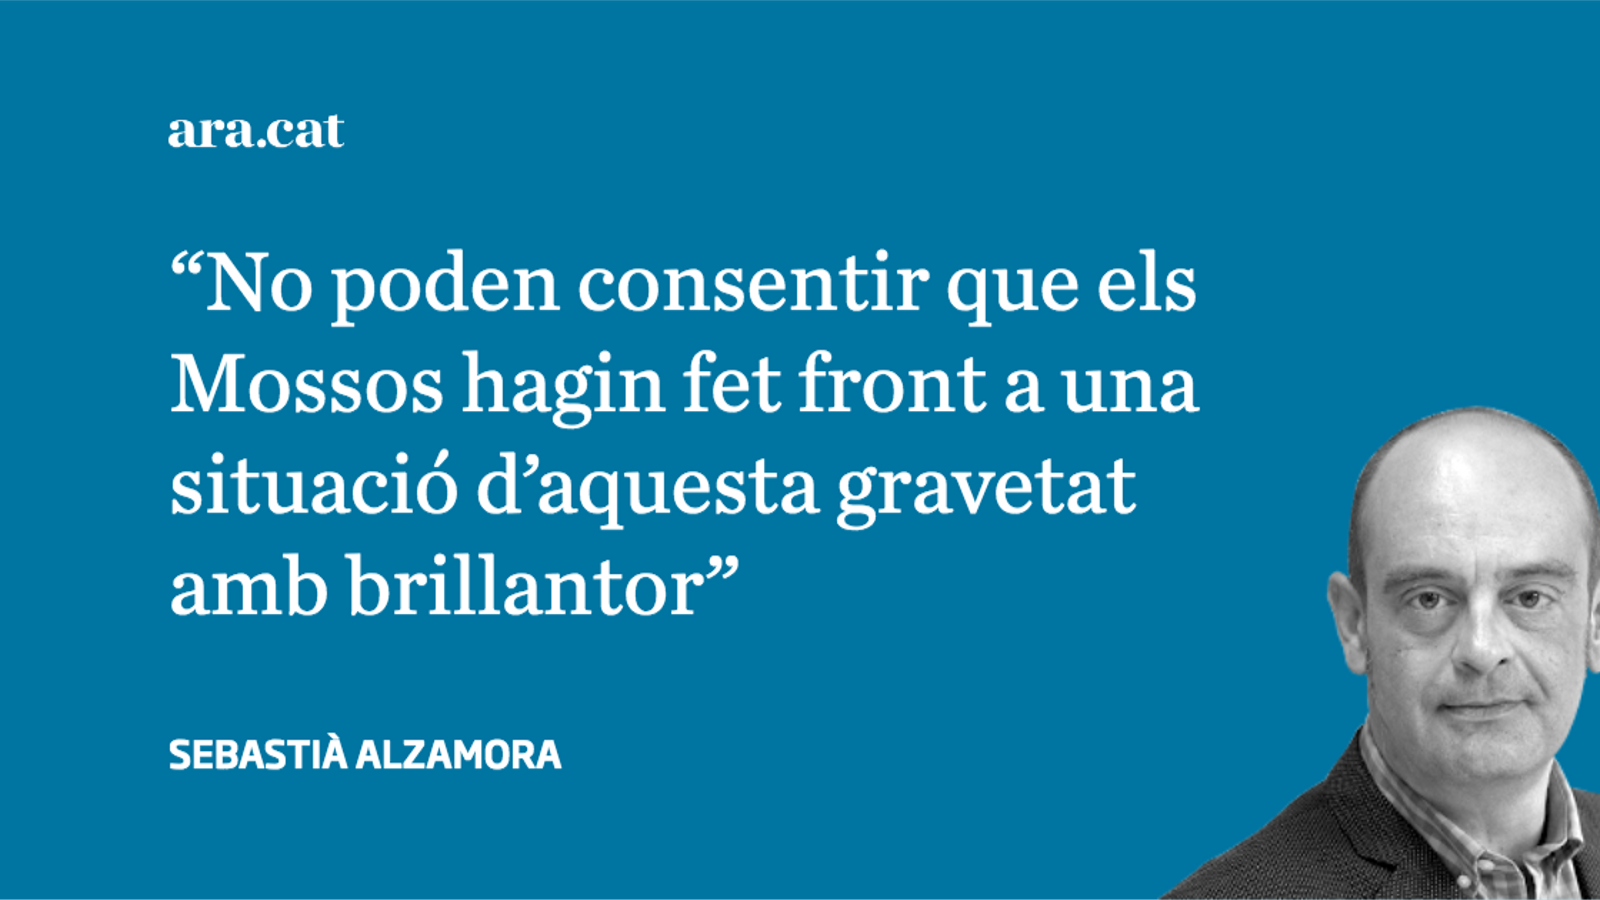 Un estat autosuficient, diu la policia espanyola